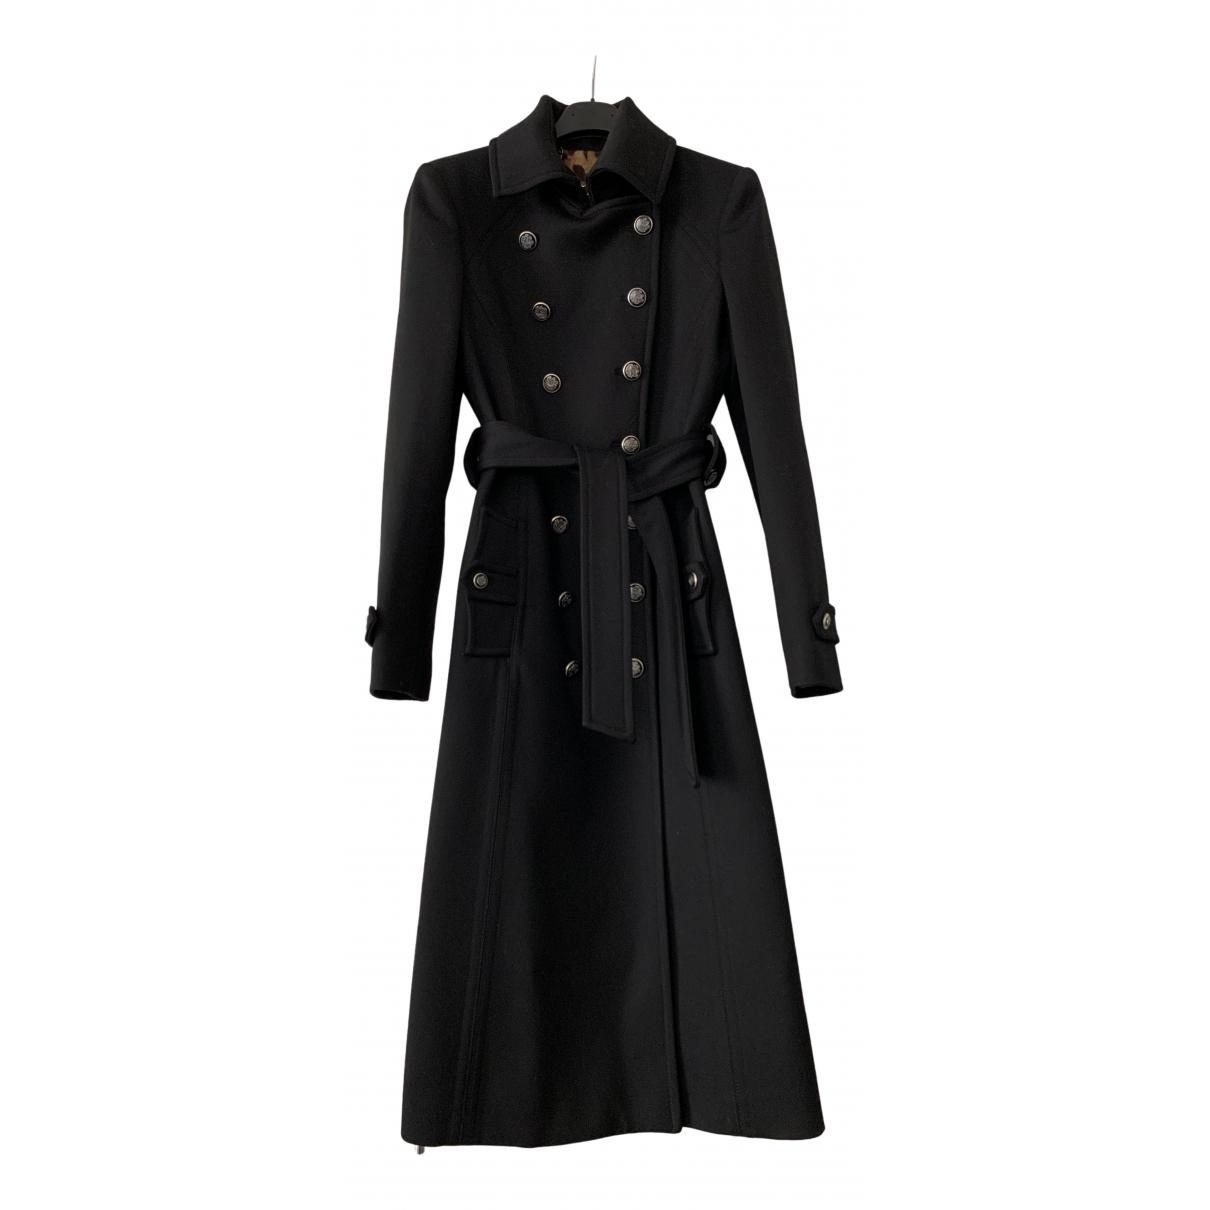 Abrigo de Lana Dolce & Gabbana